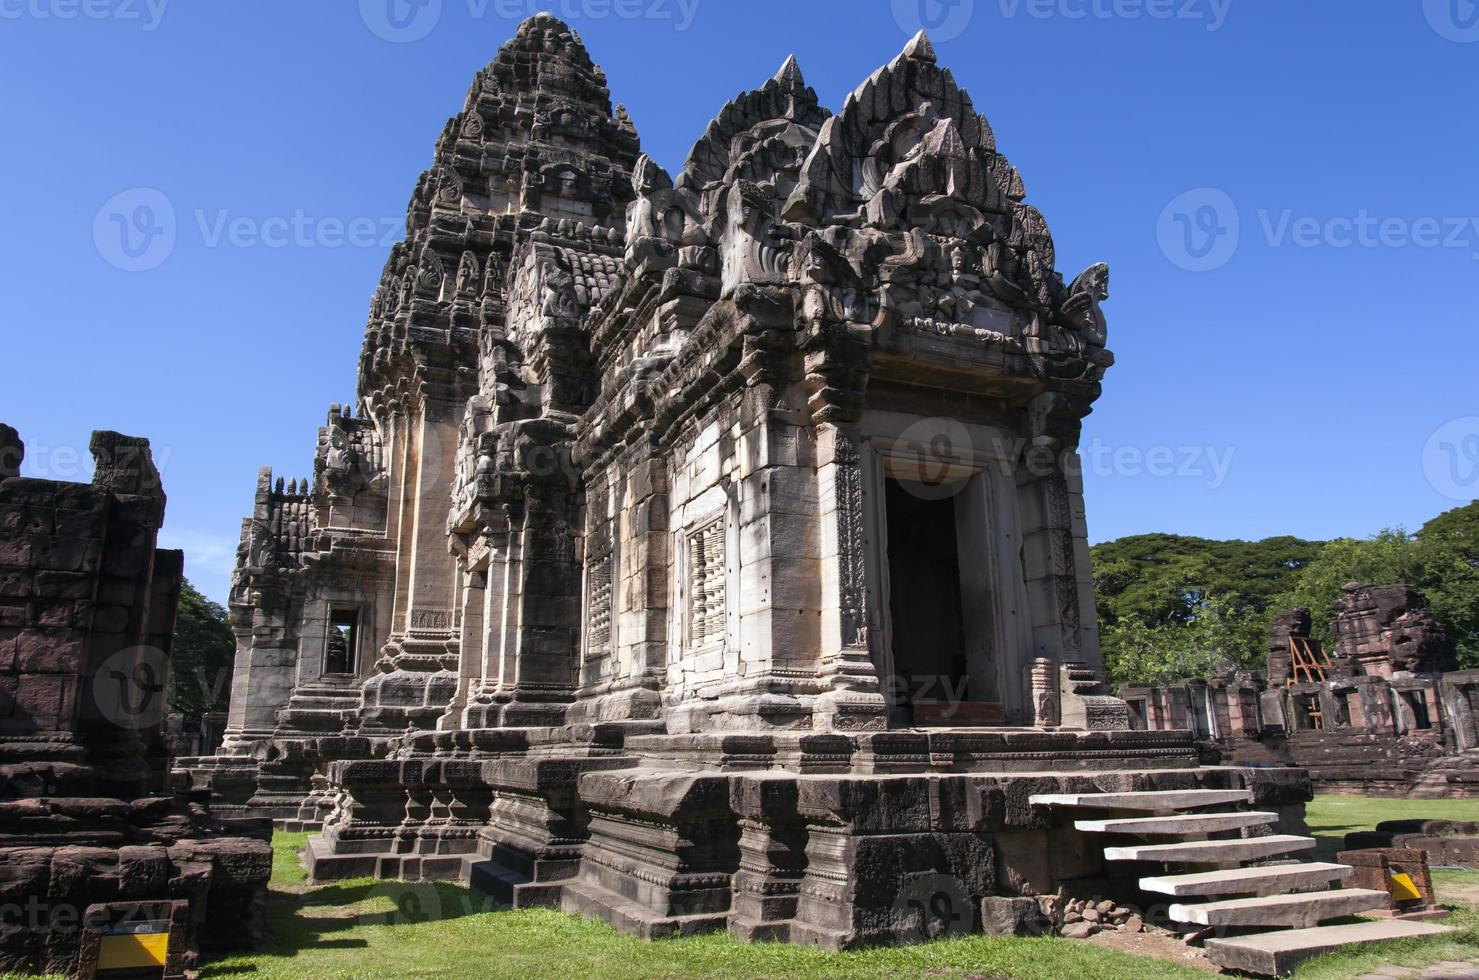 der Haupt-Prang, Hauptturm im Phimai Historical Park, Thailand foto